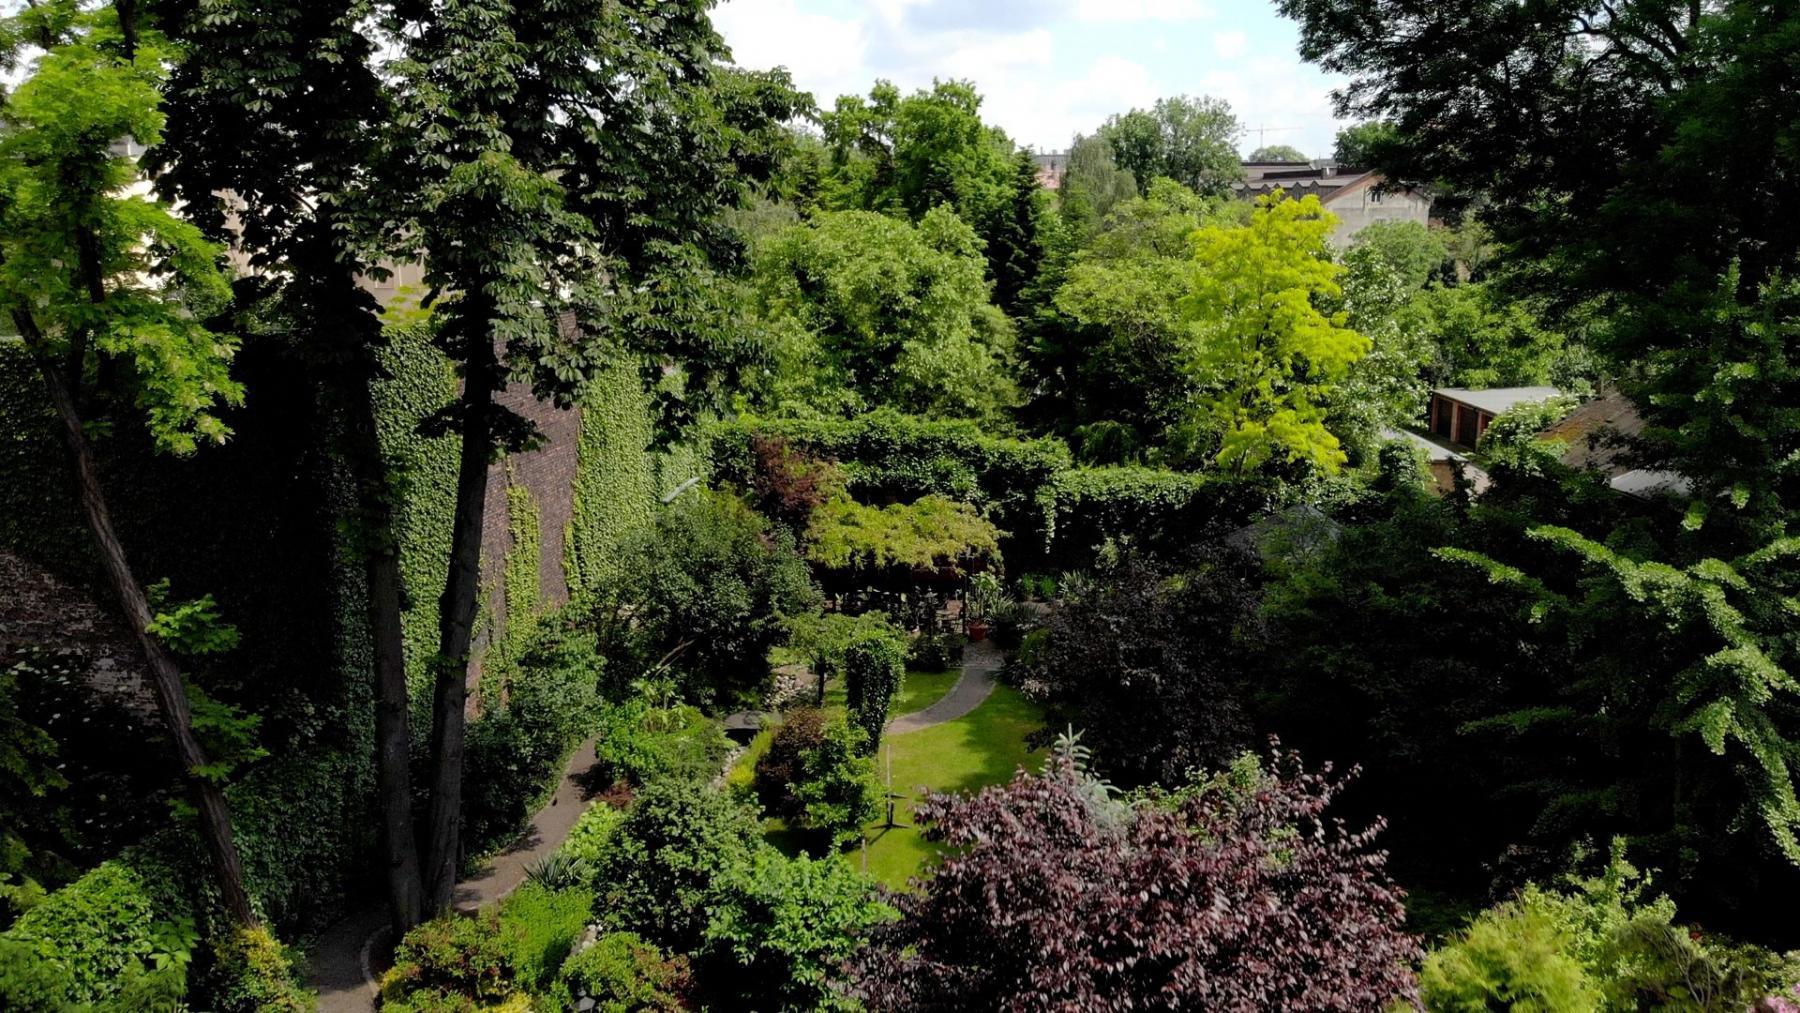 piękny ogród karmelicka 27 kraków